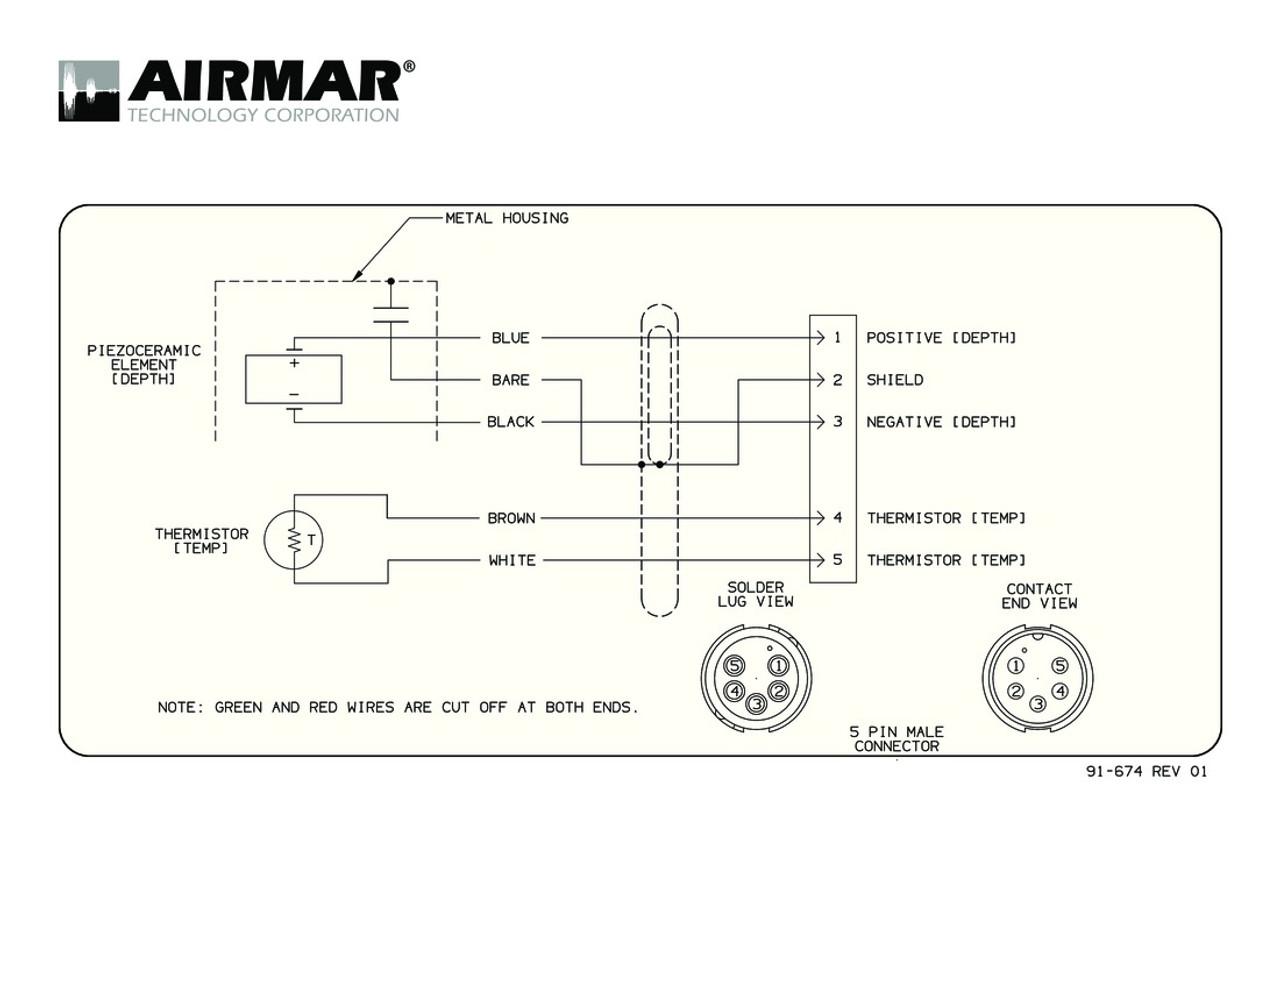 airmar wiring diagram mix and match 600w blue bottle marine airmar wiring diagrams [ 1280 x 989 Pixel ]